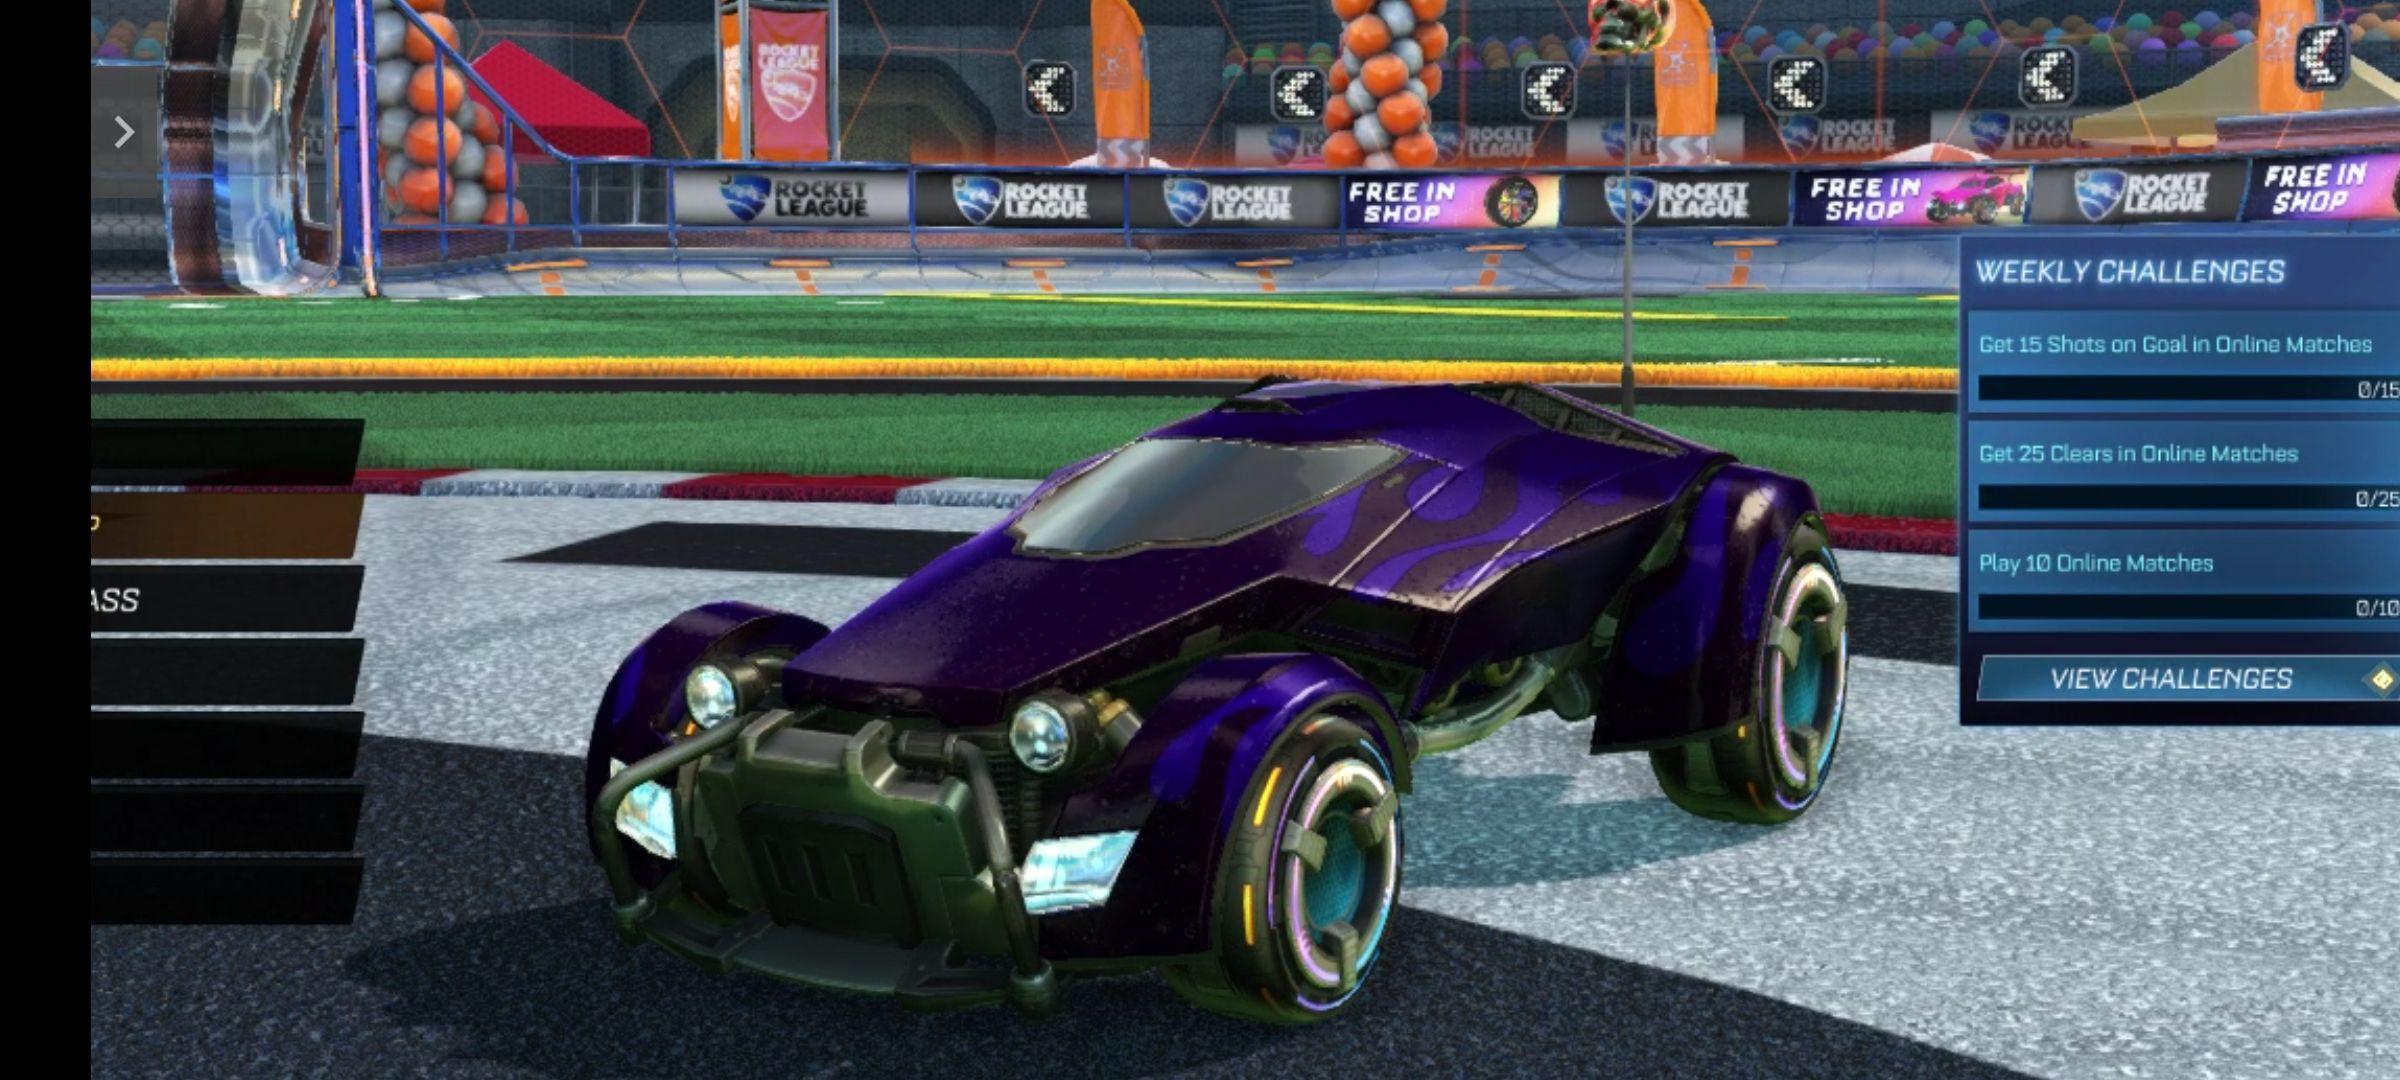 Claim free SARPBC-10 Wheels in Rocket League via Epic Games